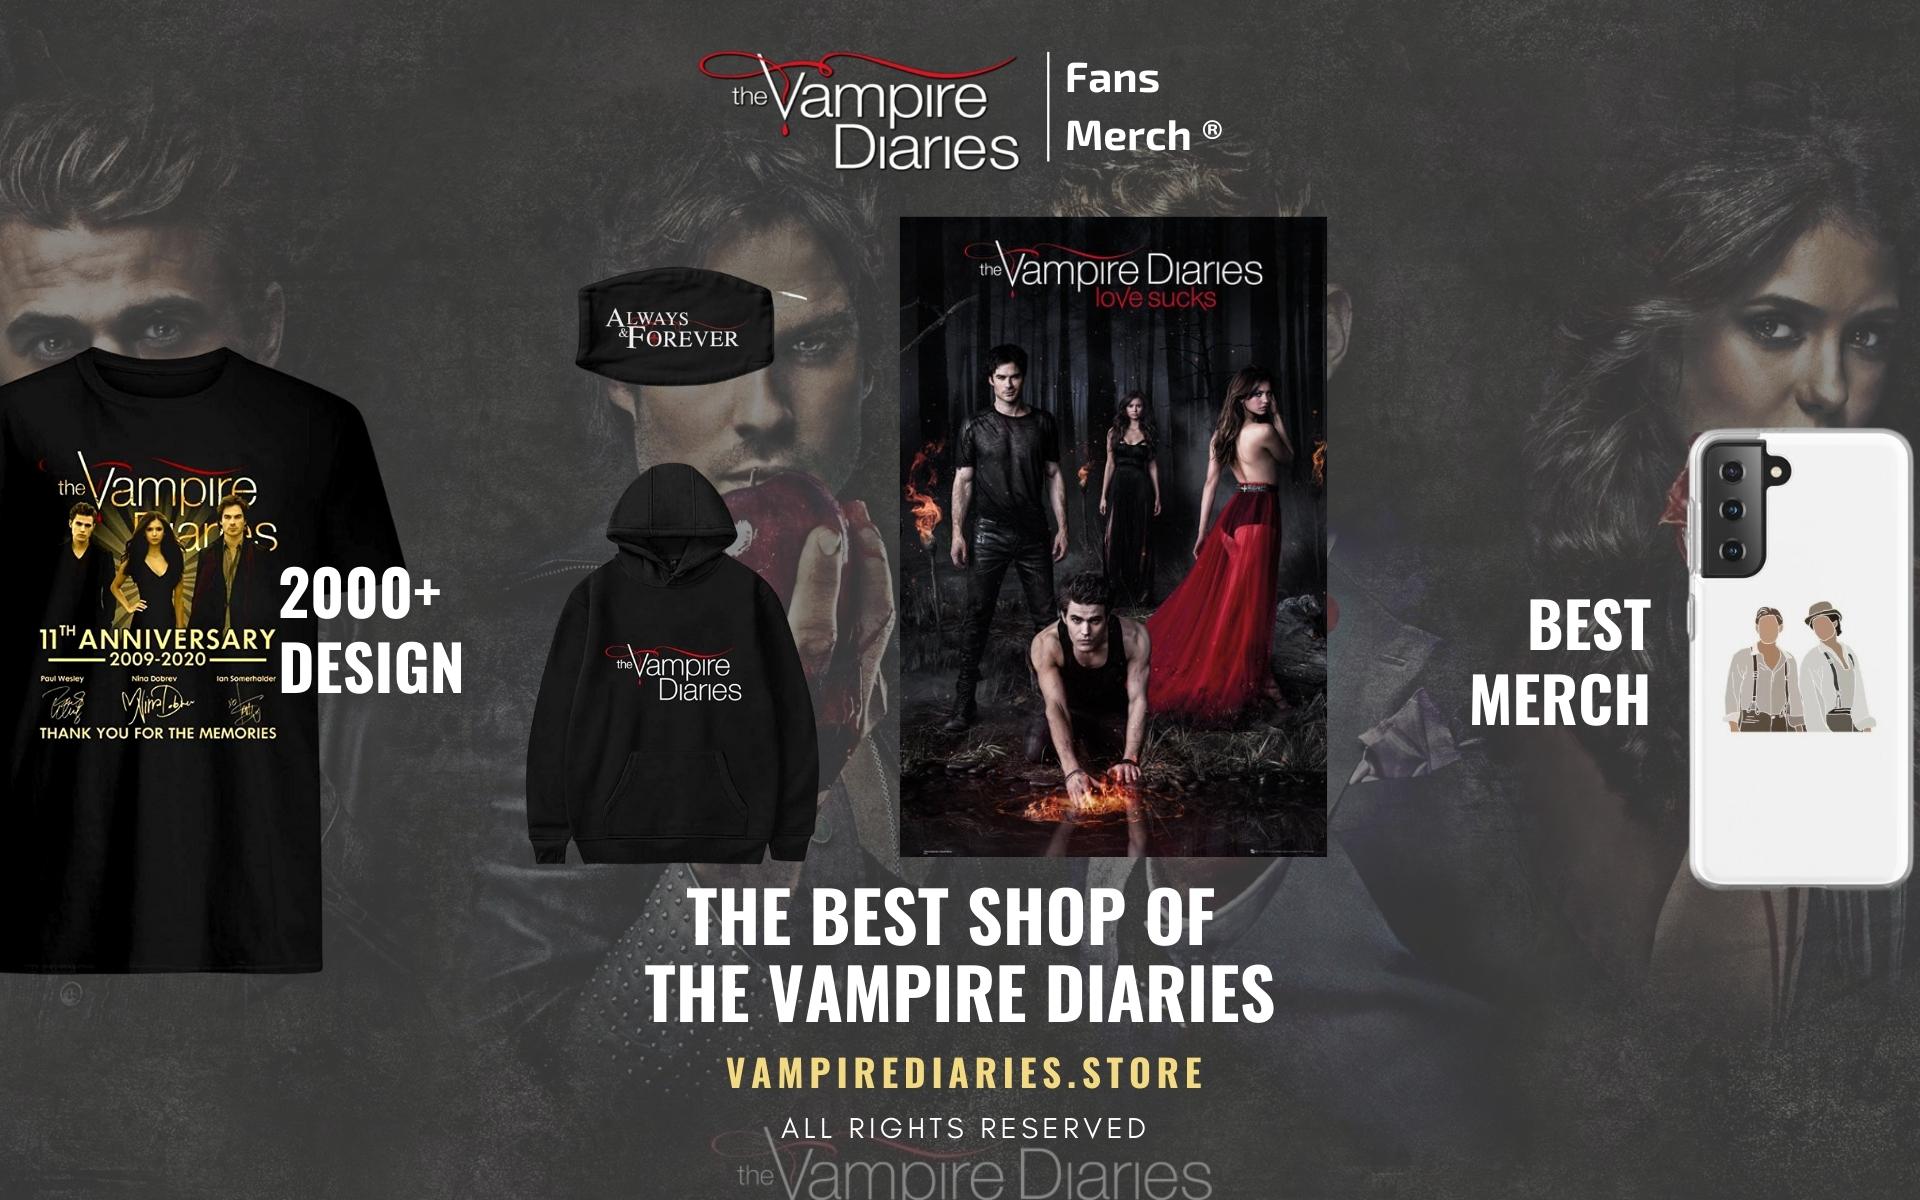 vampire diaries Merch Web Banner - Vampire Diaries Merch